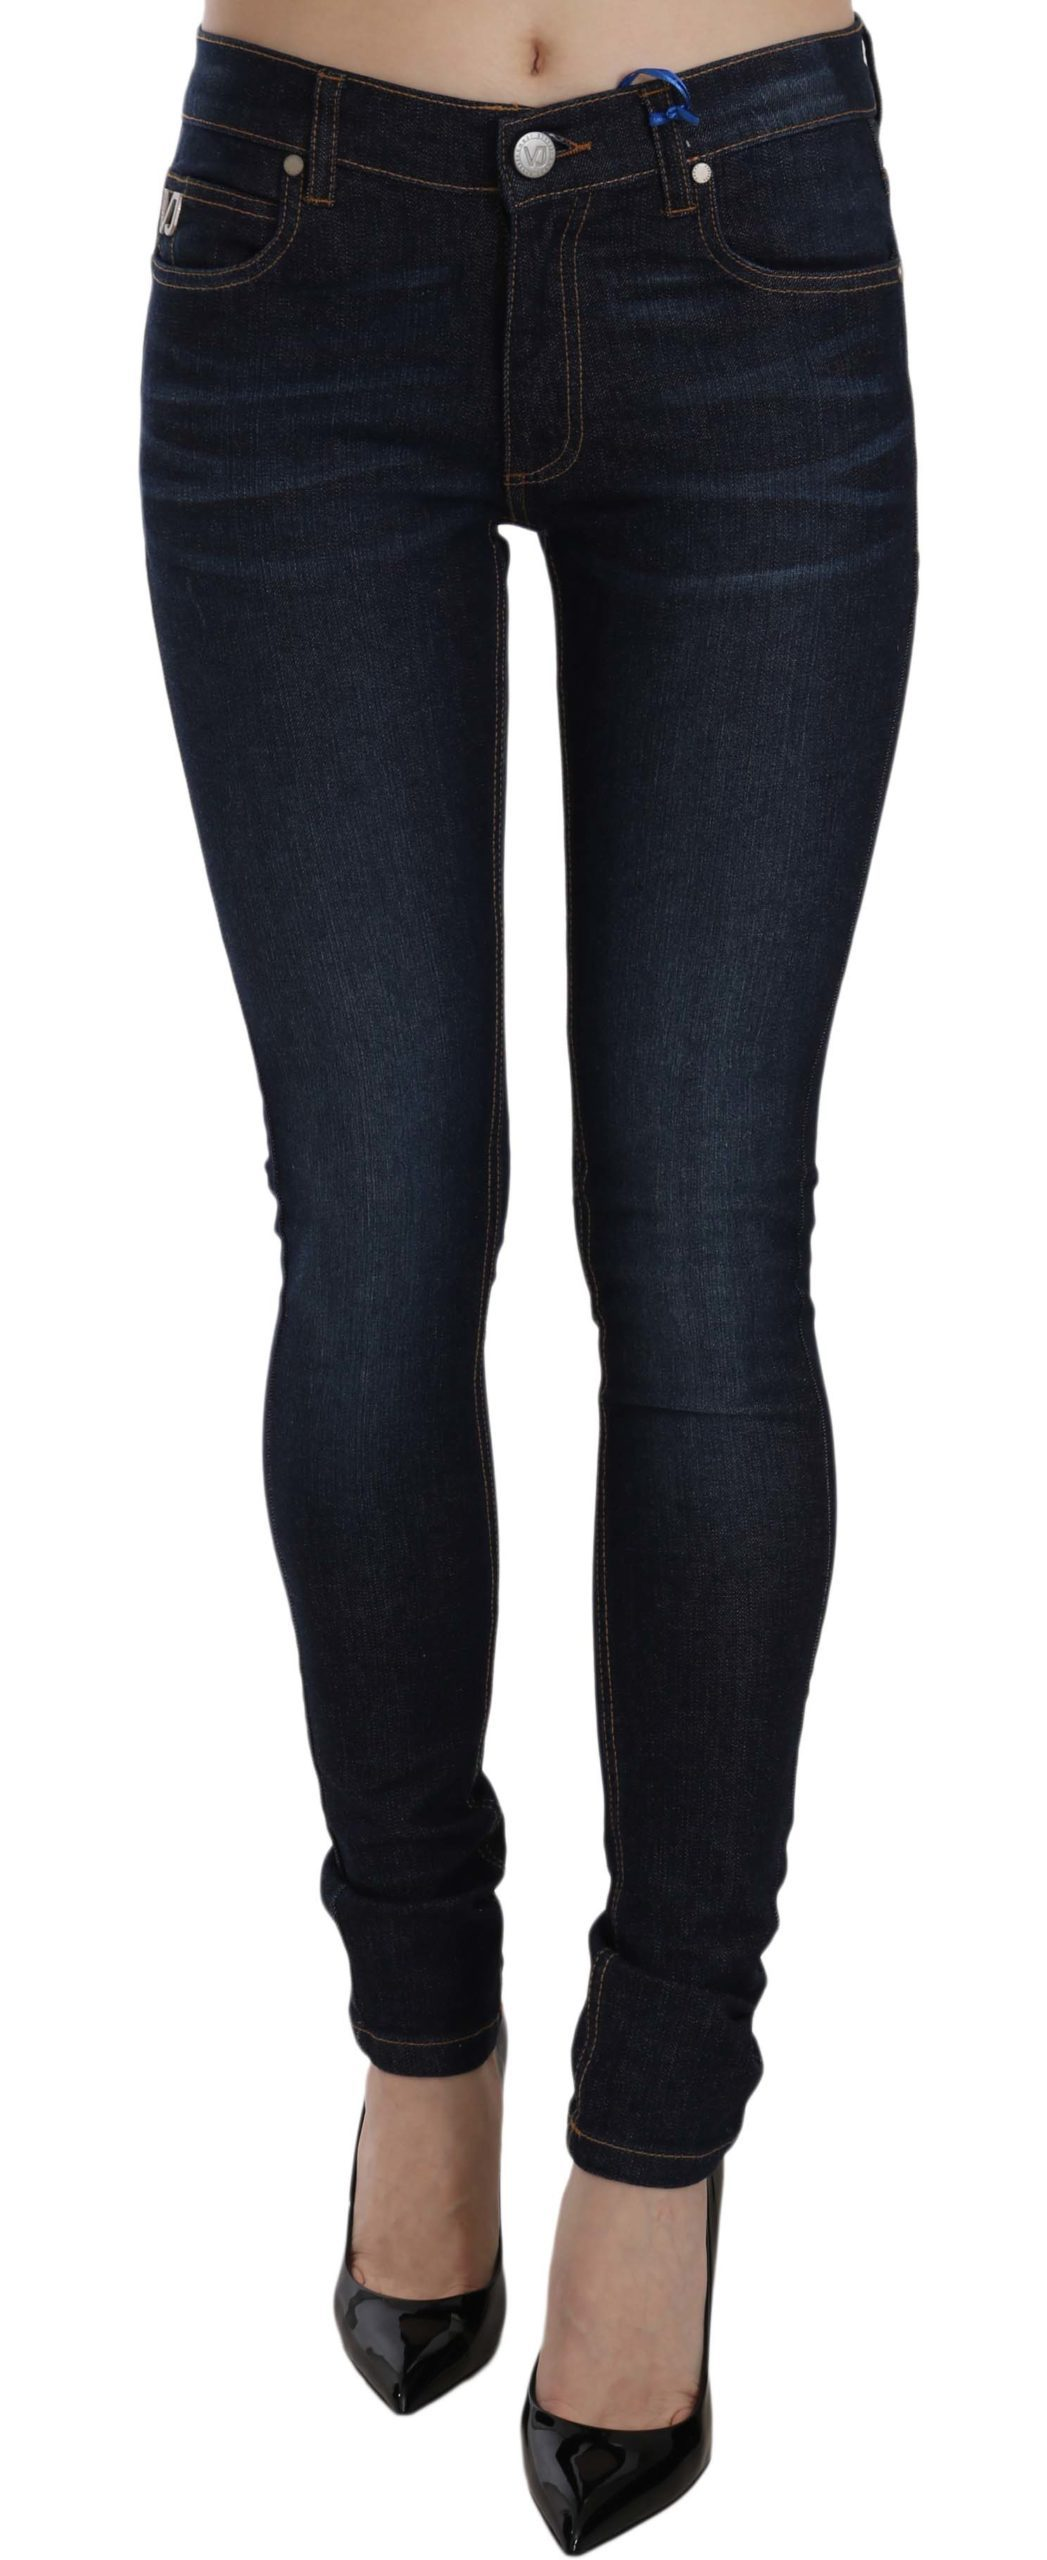 Versace Jeans Women's Stretch Denim Cotton Skinny Fit Trouser Blue PAN61015 - W30